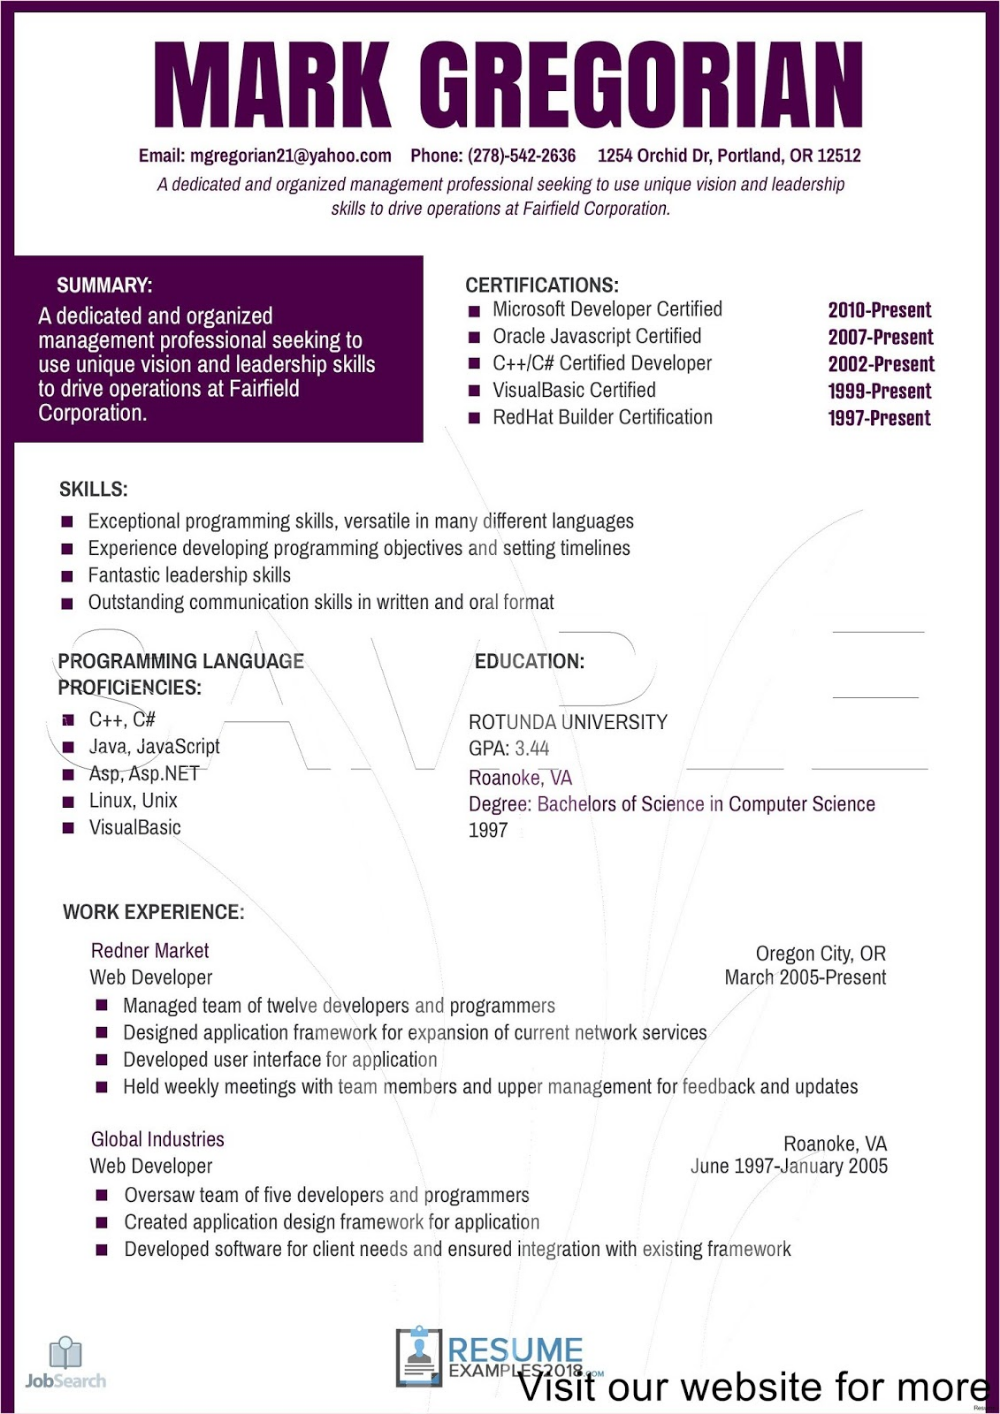 Sample Child Care Resume Objectives Australia 2020 Sample Child